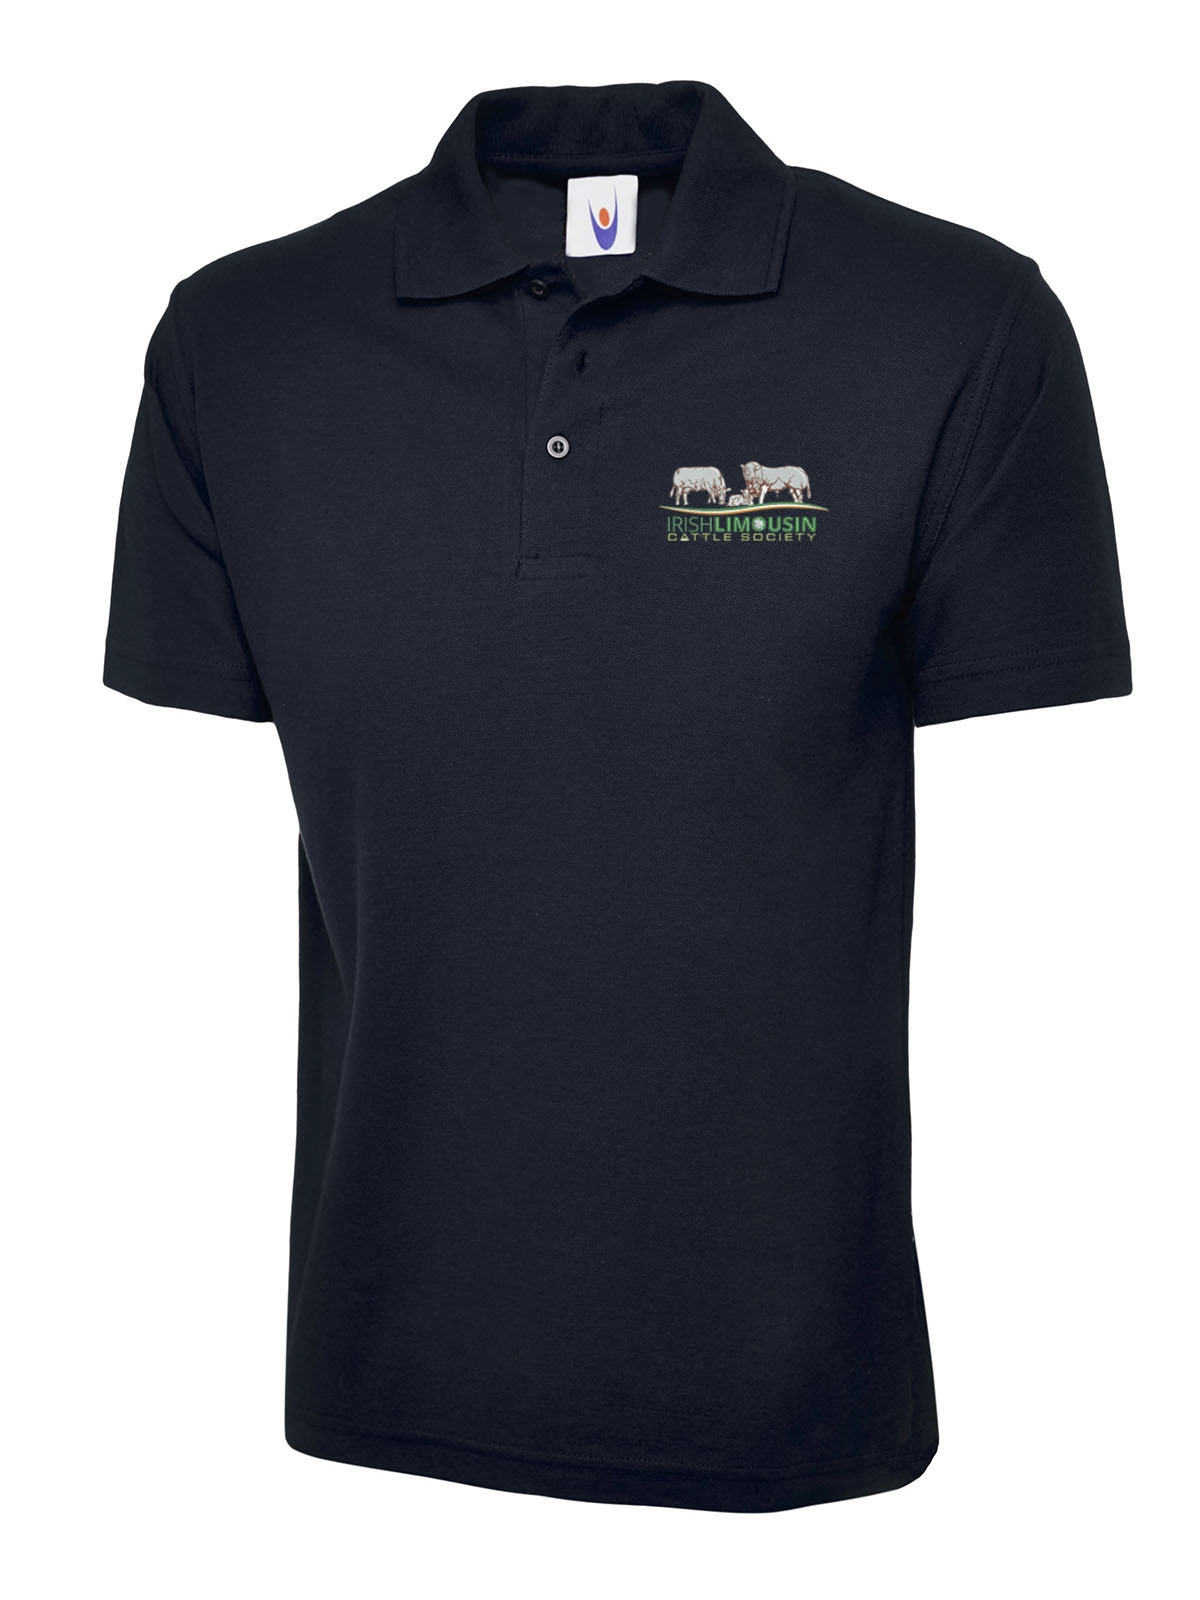 Irish Limousin Cattle Society Uneek Child Polo Shirt